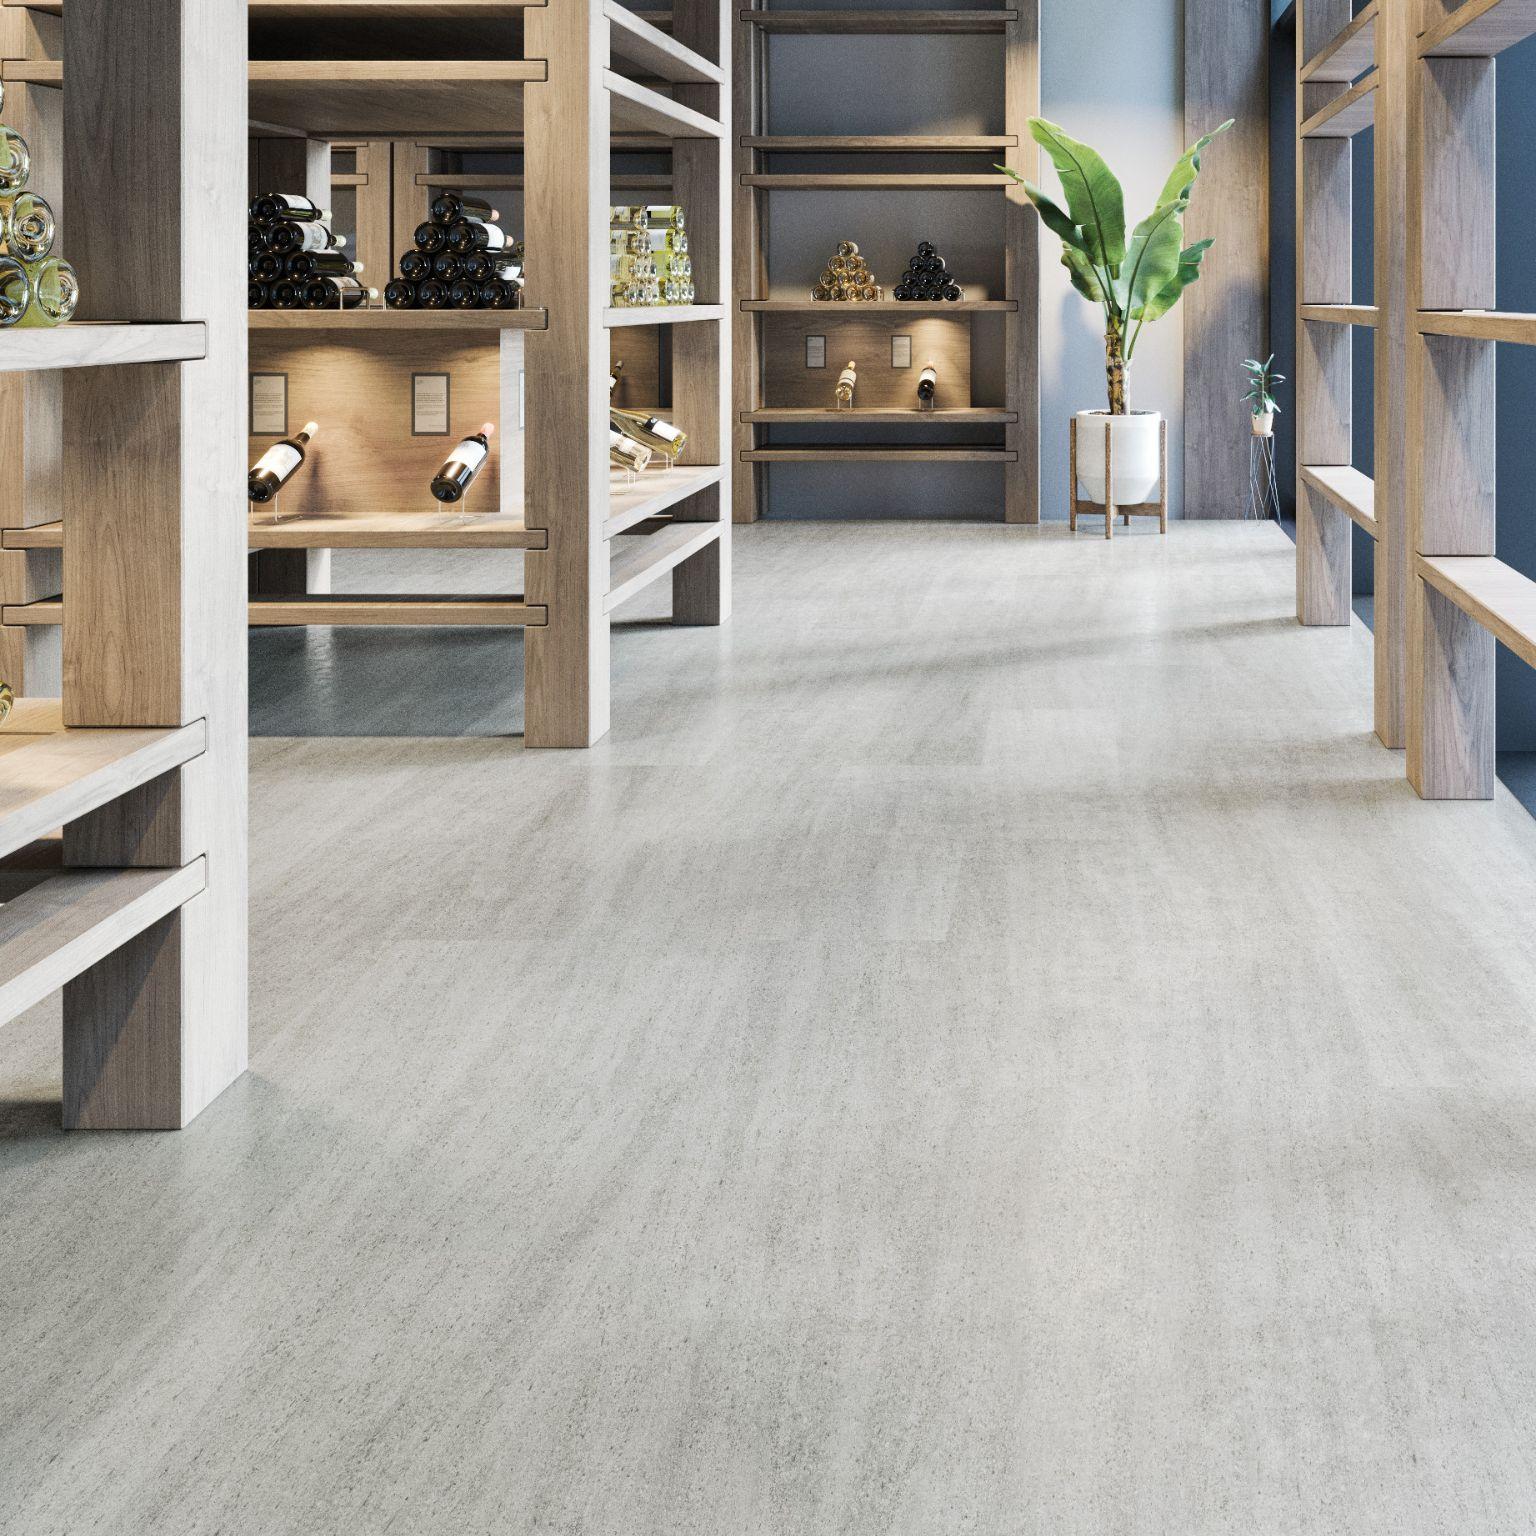 Mannington Commercial LVT Luxury Vinyl Tile Retail Flooring Stone_Terra_Diamond_D215_RS_Retail